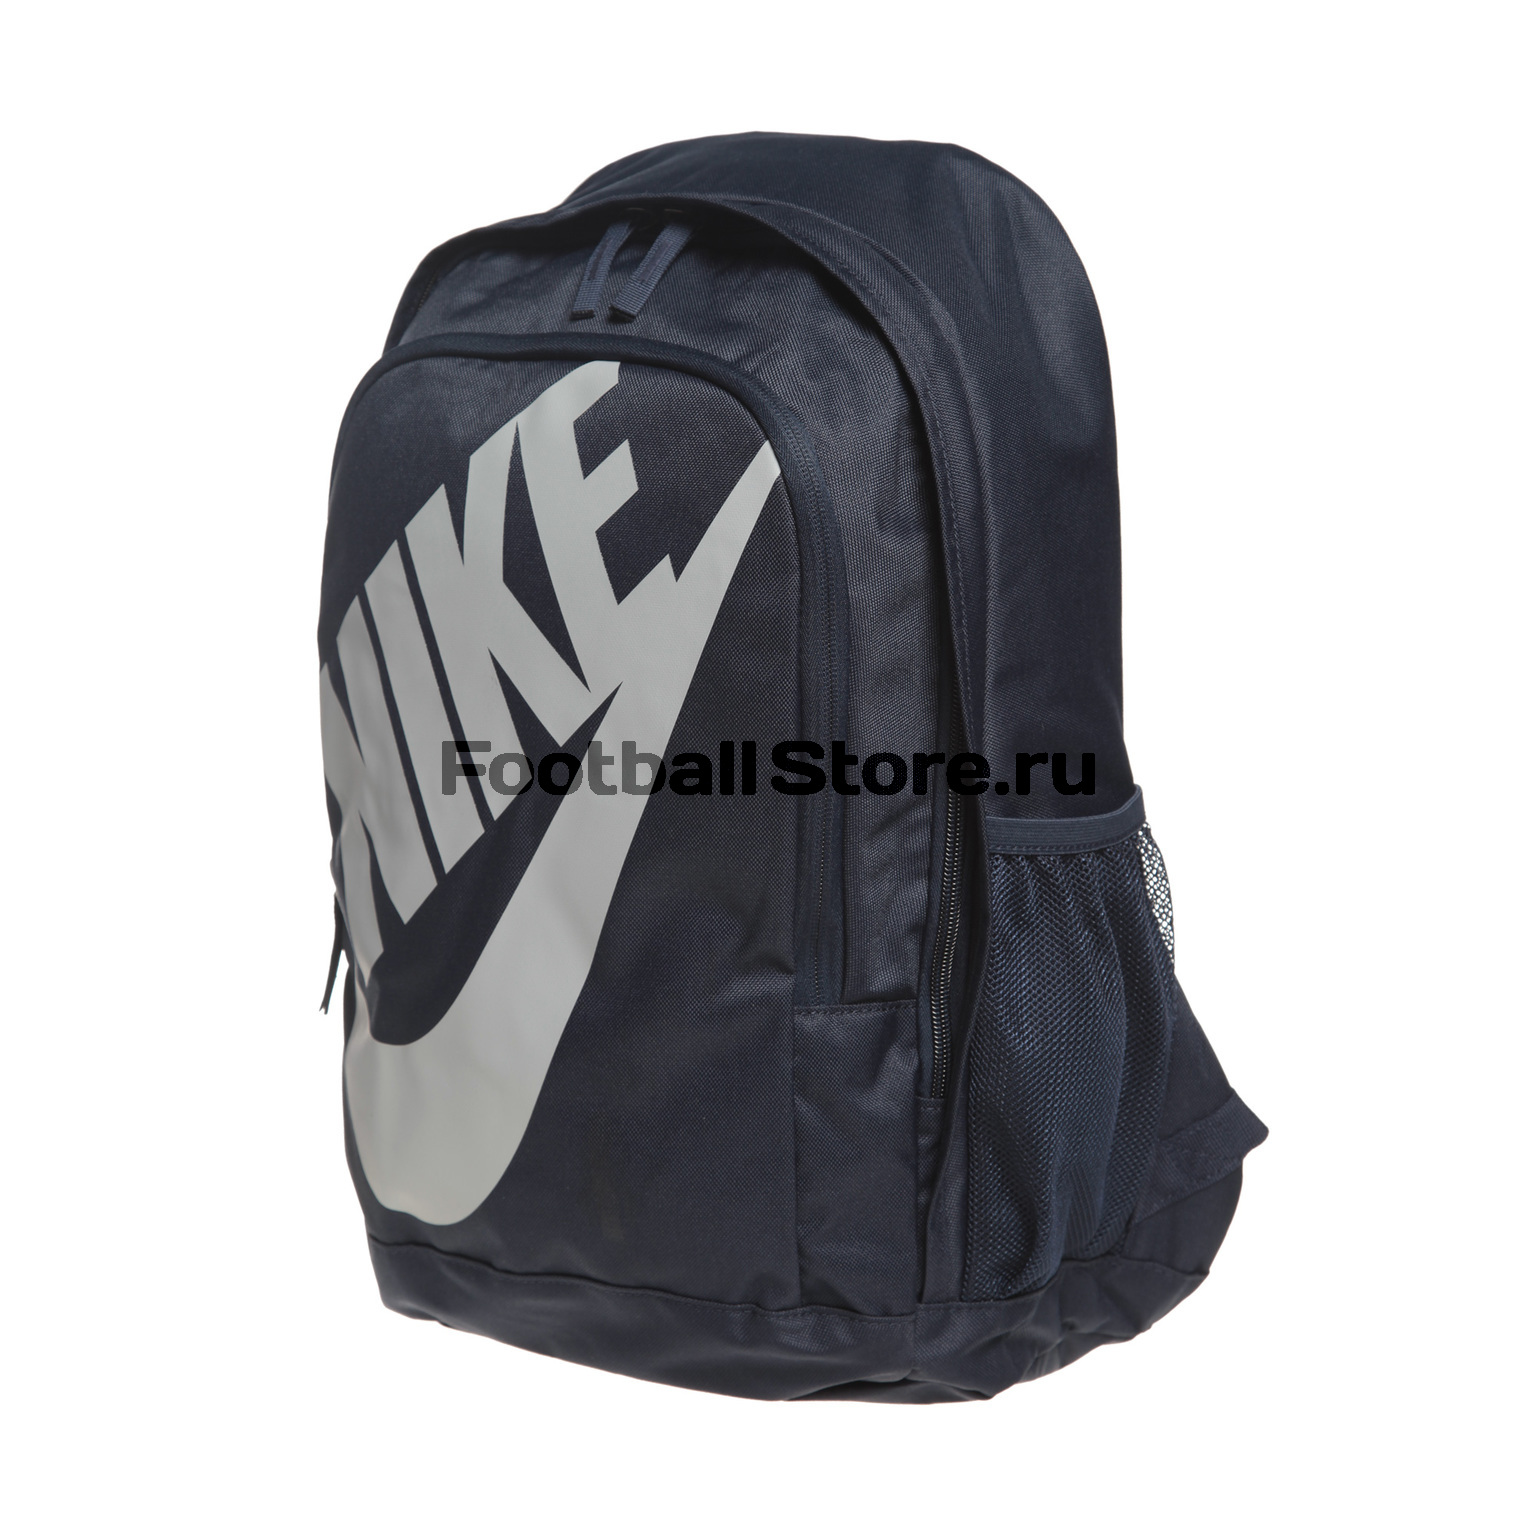 Рюкзак Nike Hayward Futura BA5217-451 бра 29 x 18 х 25 см